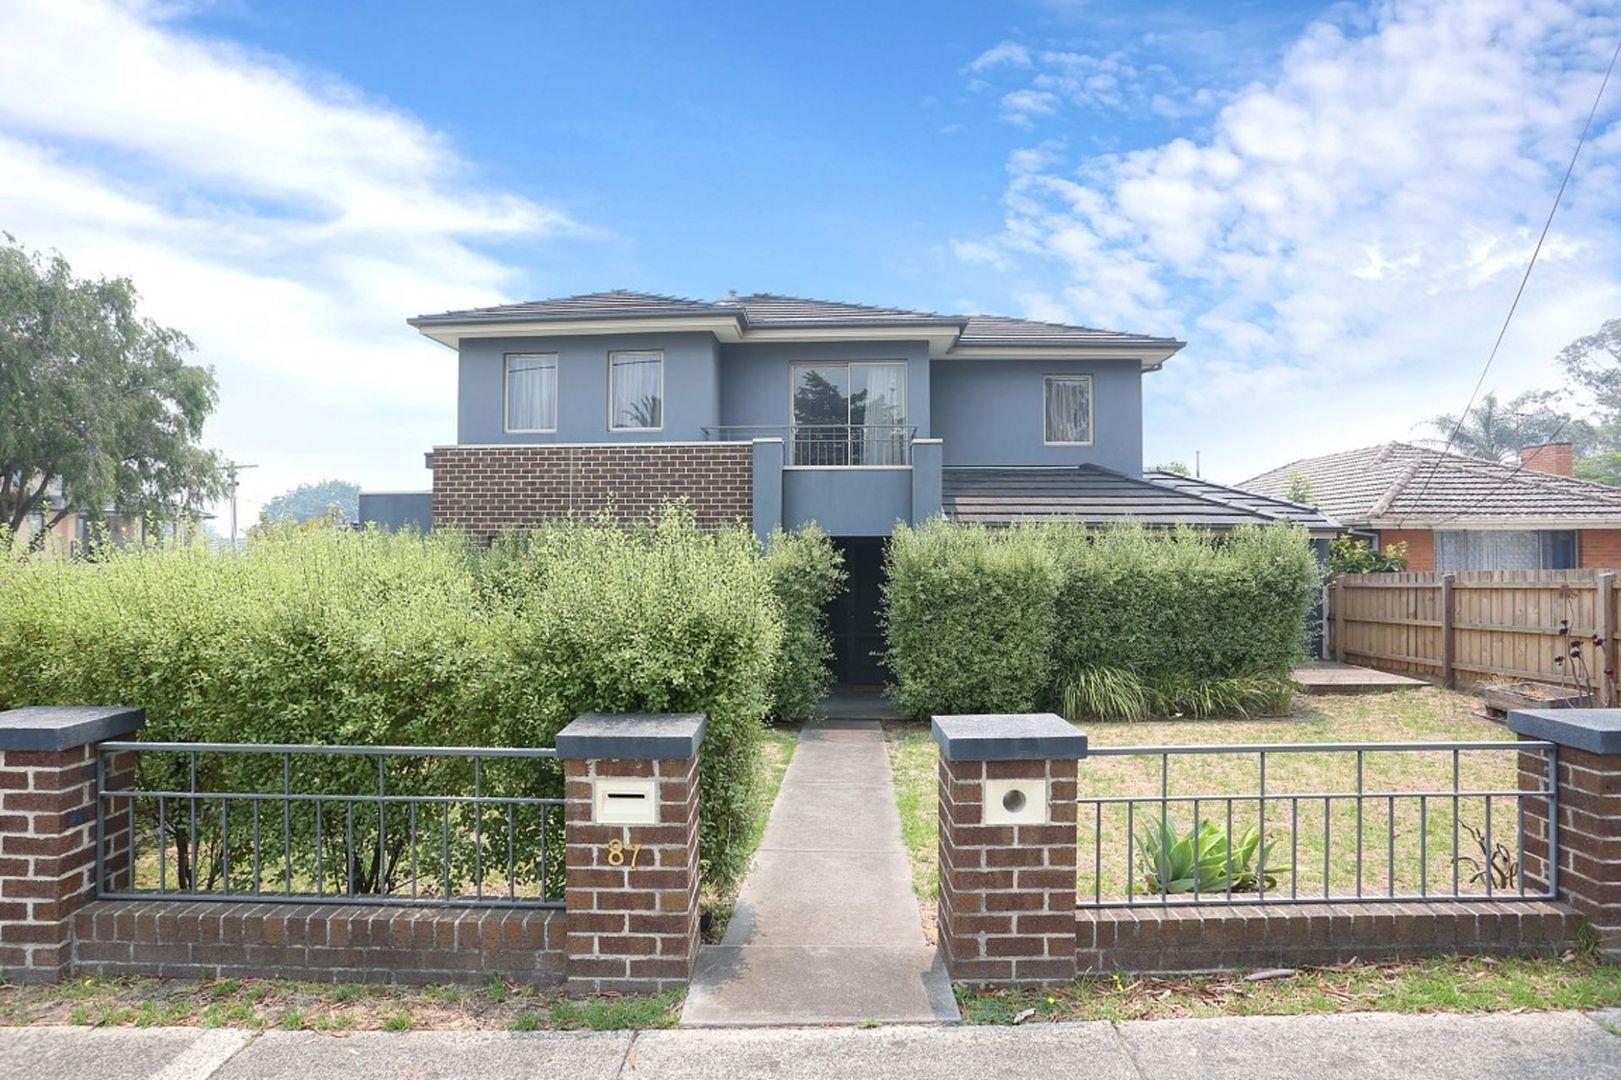 87 Ferntree Gully Rd, Mount Waverley VIC 3149, Image 0